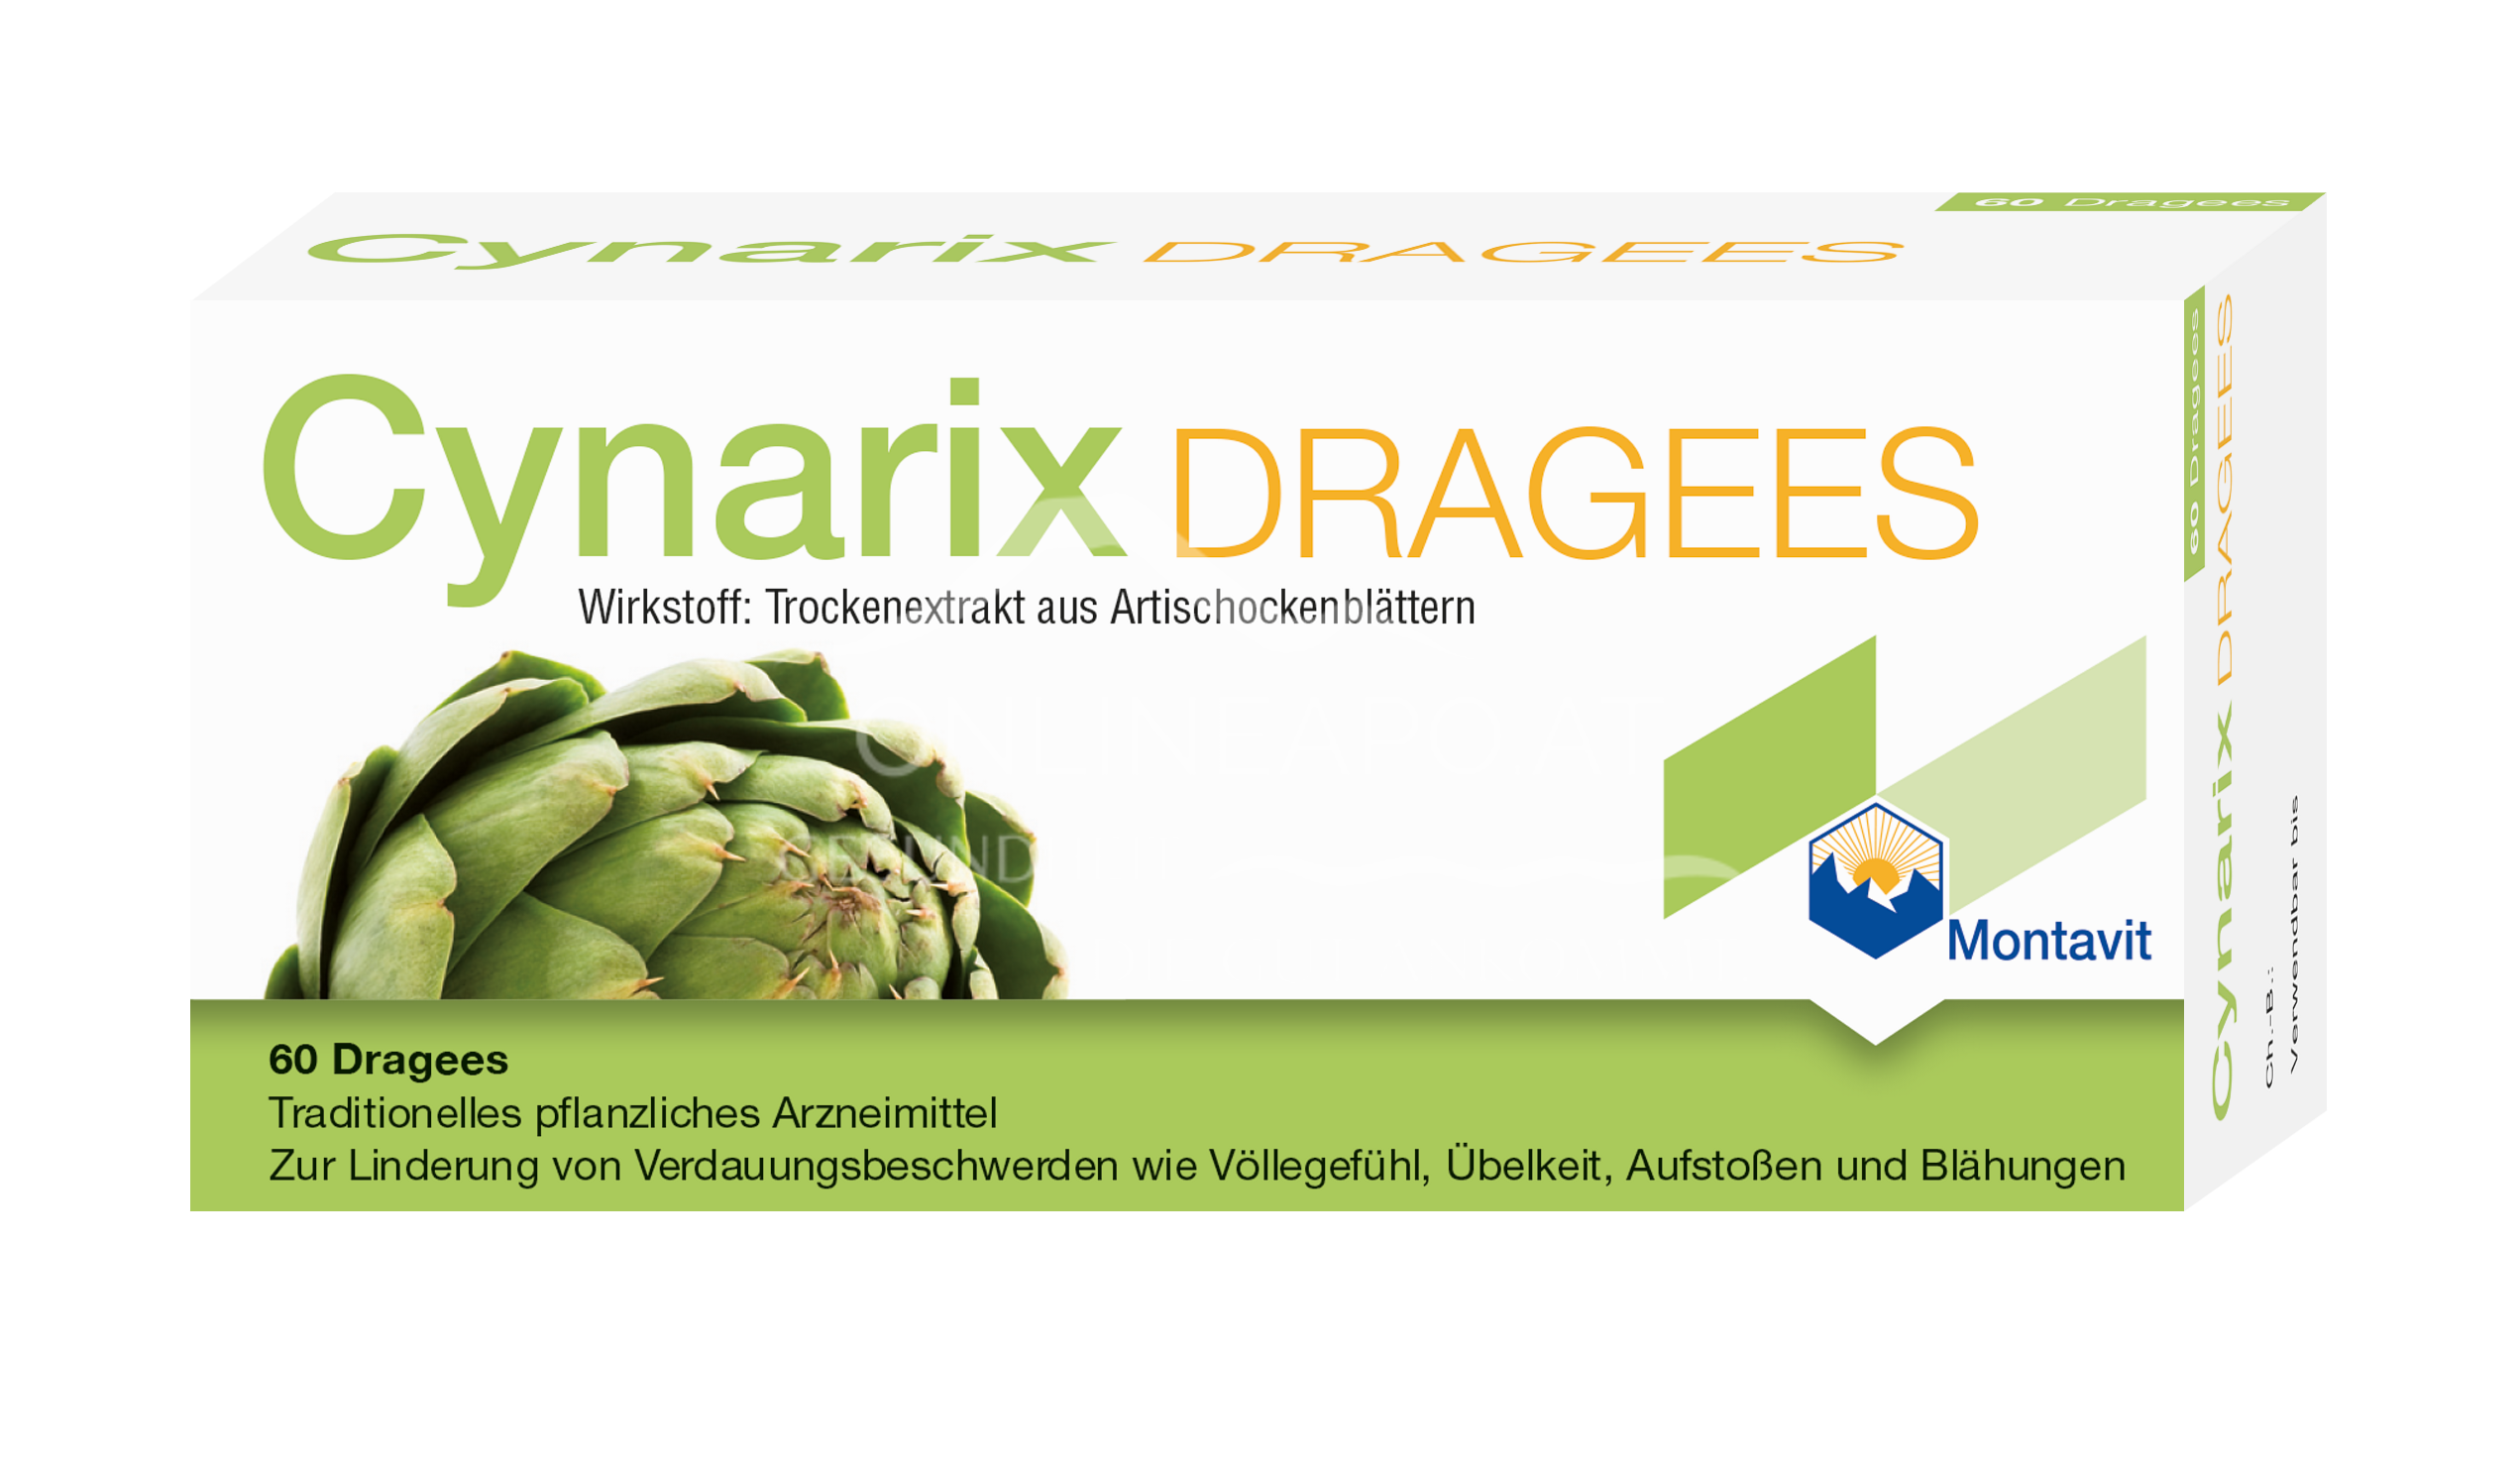 Cynarix Dragees